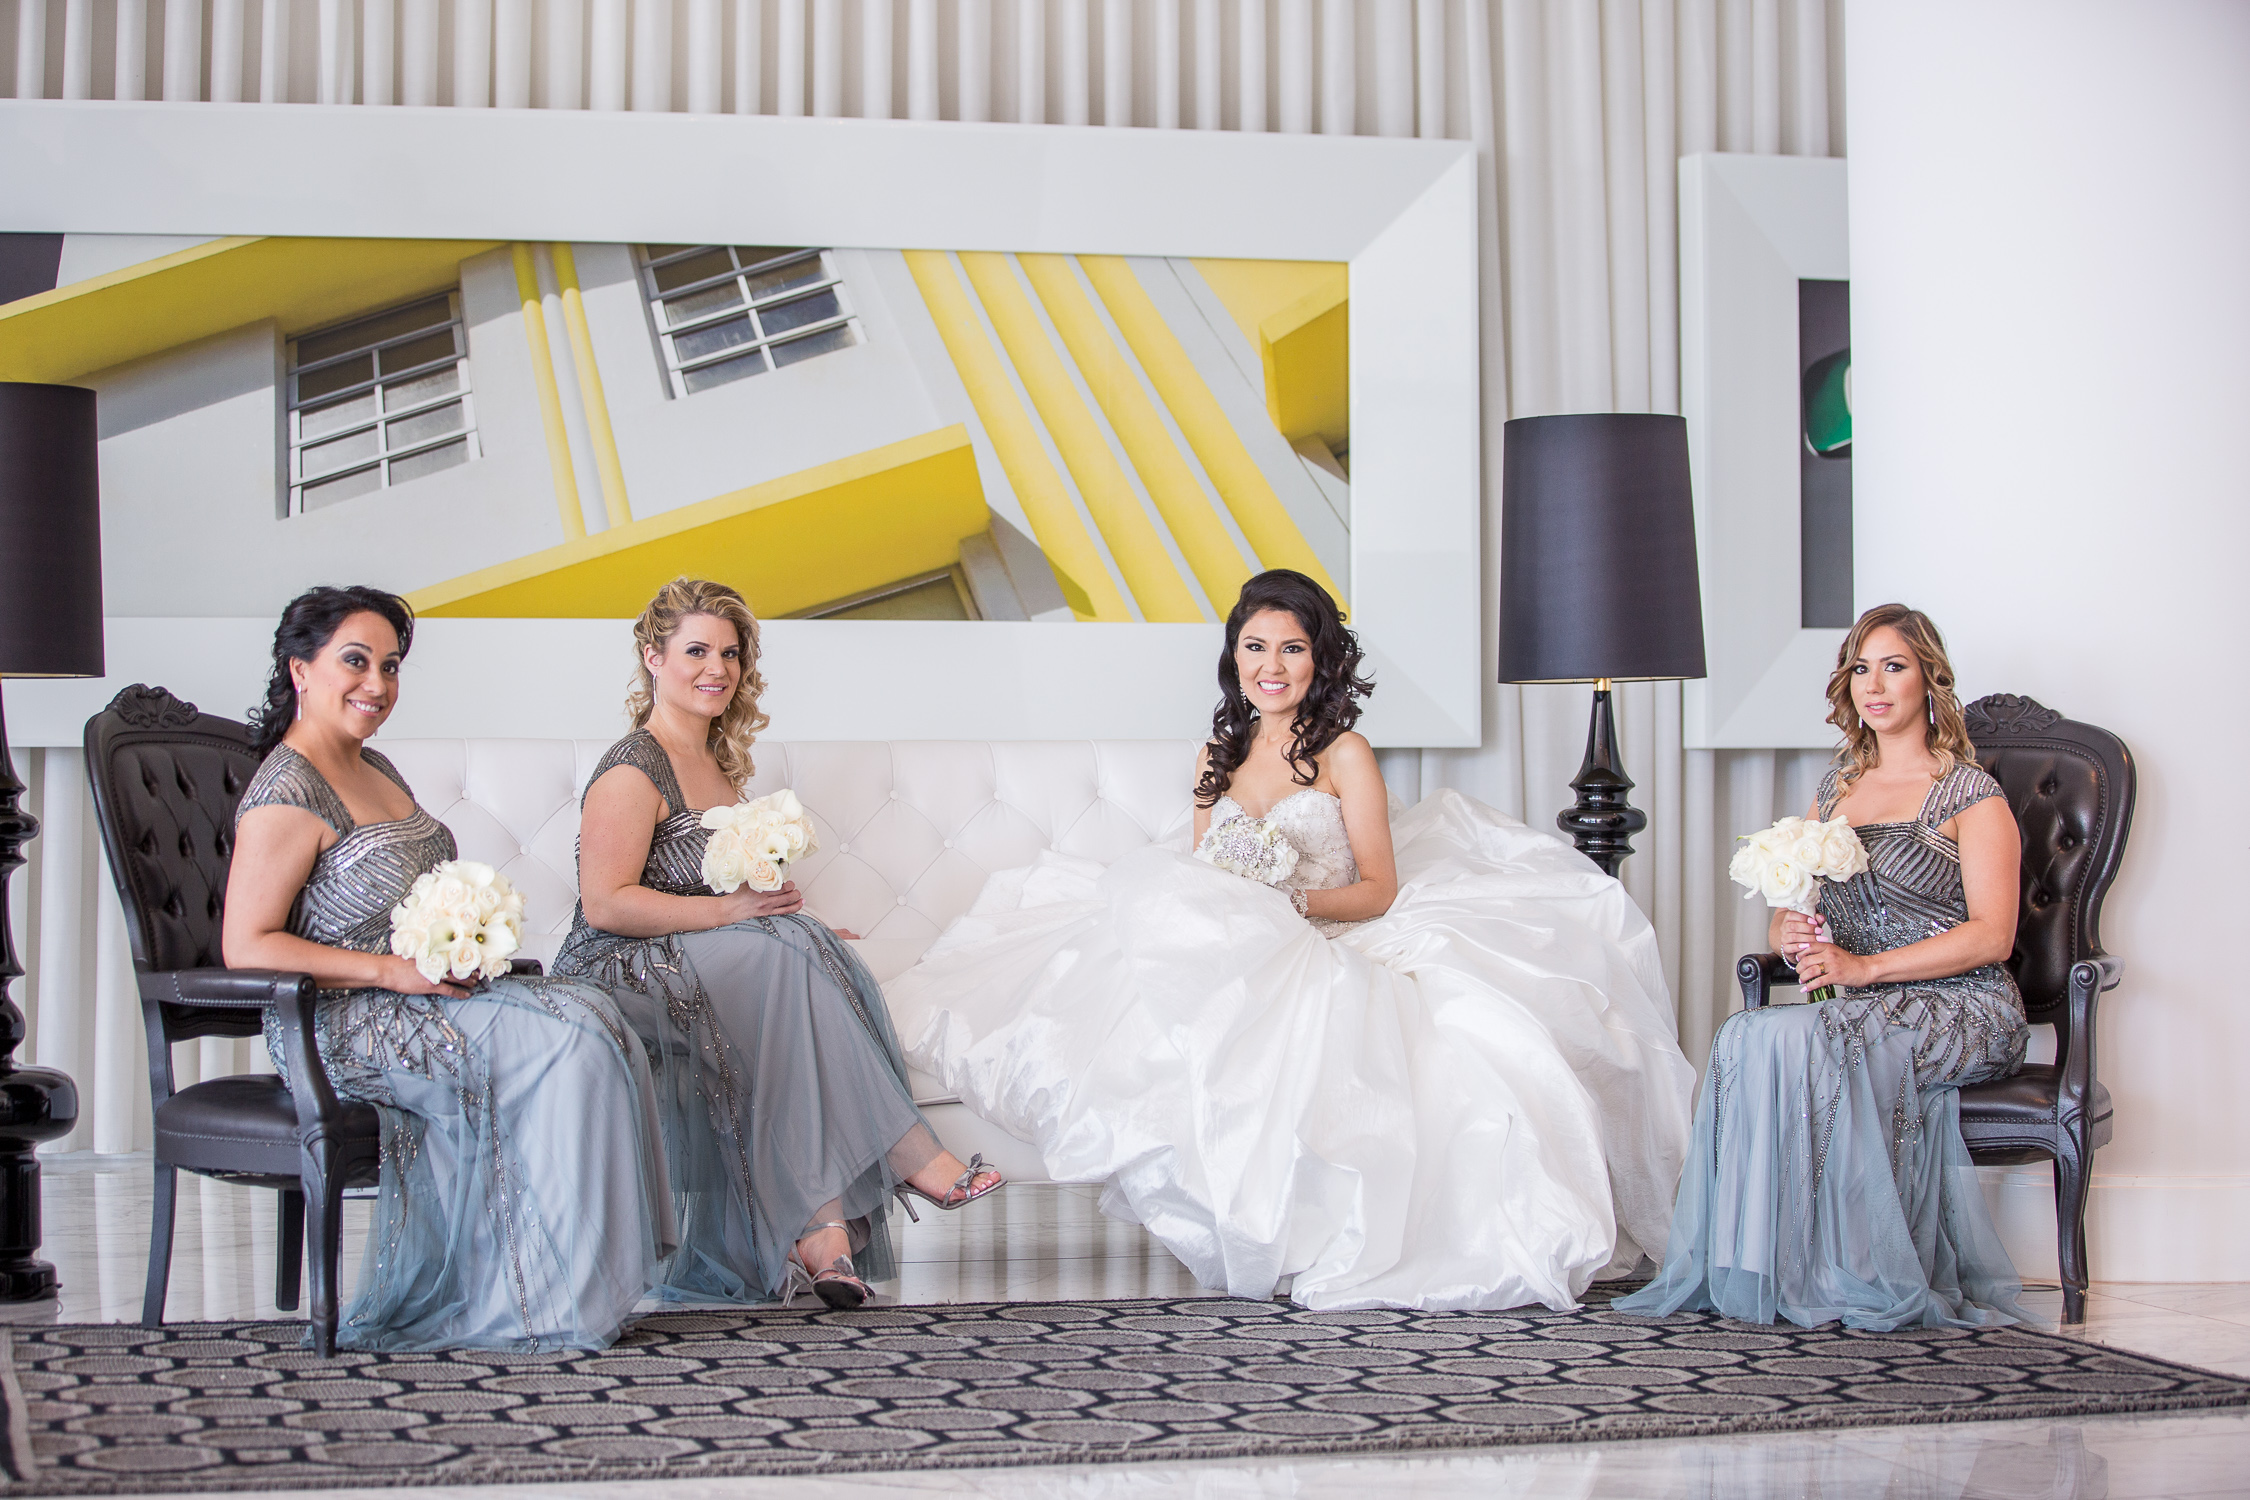 Paradise-Banquet-Hall-Wedding-Vaughan-Ontario-0017.jpg